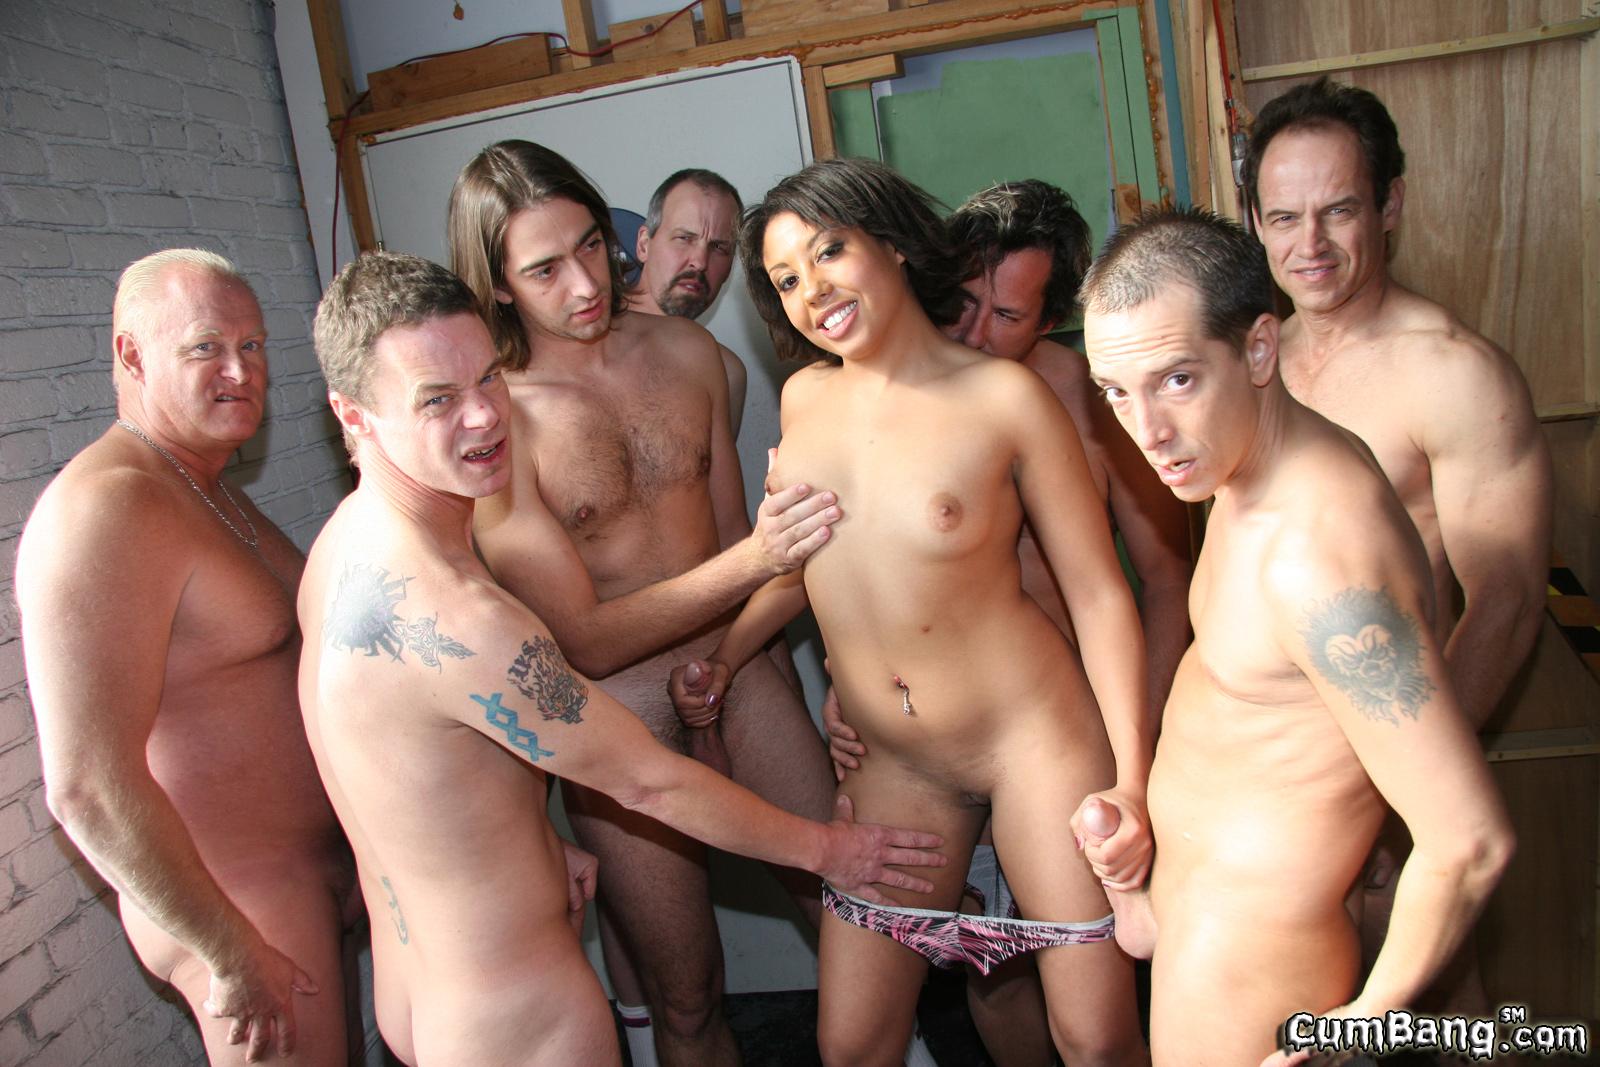 Very nice preshool nude